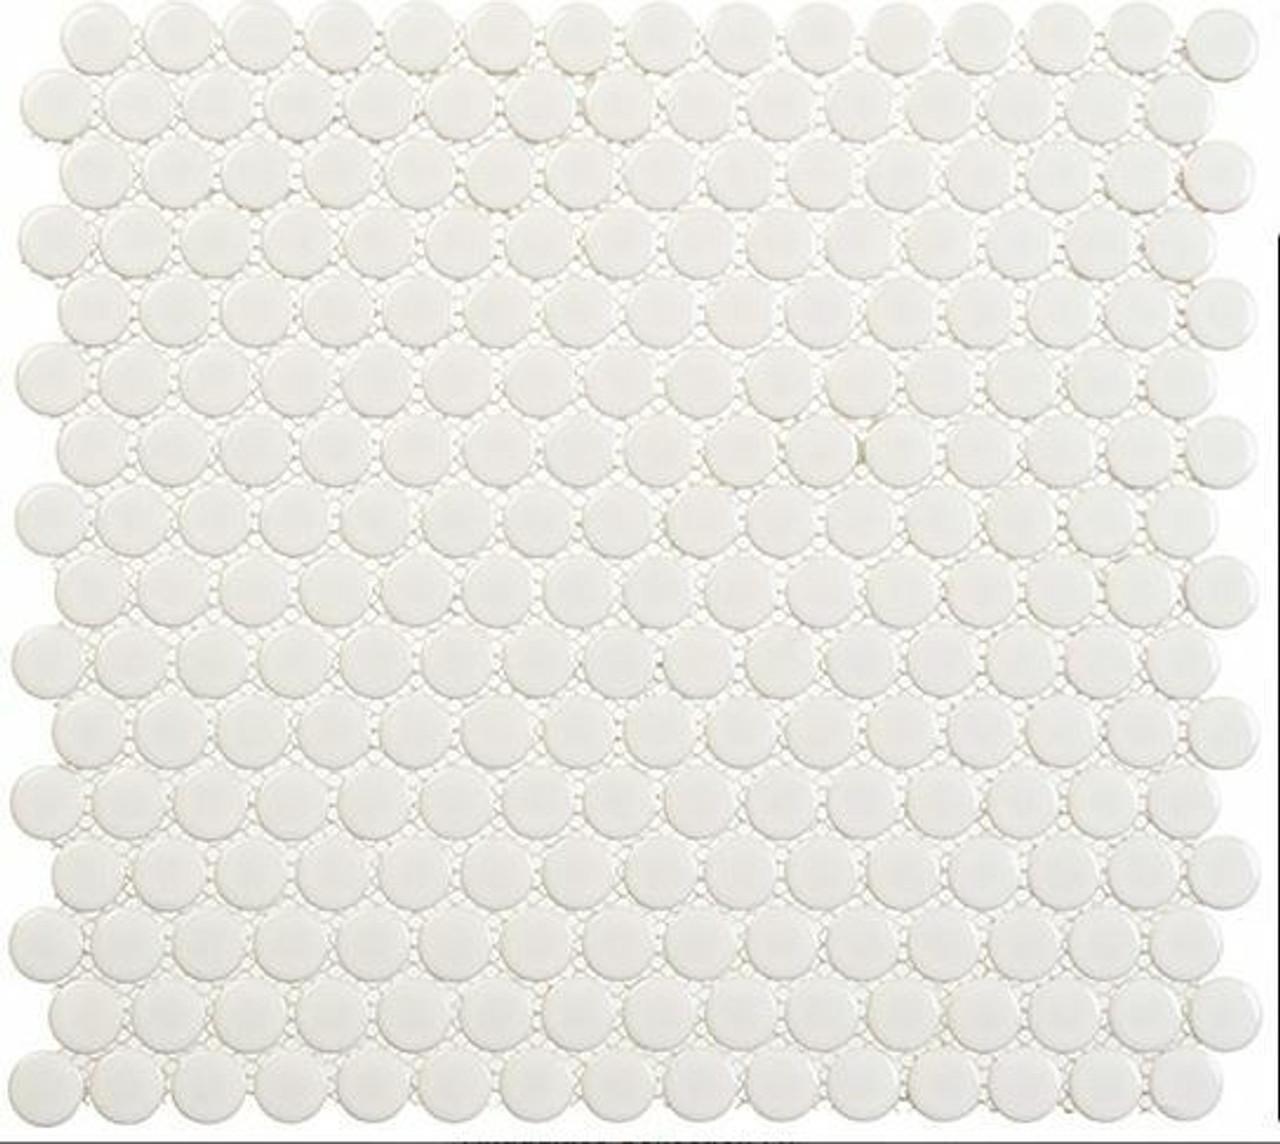 Bella Glass Tiles Freedom Avenue Penny Round Pillar Shine FDM1803